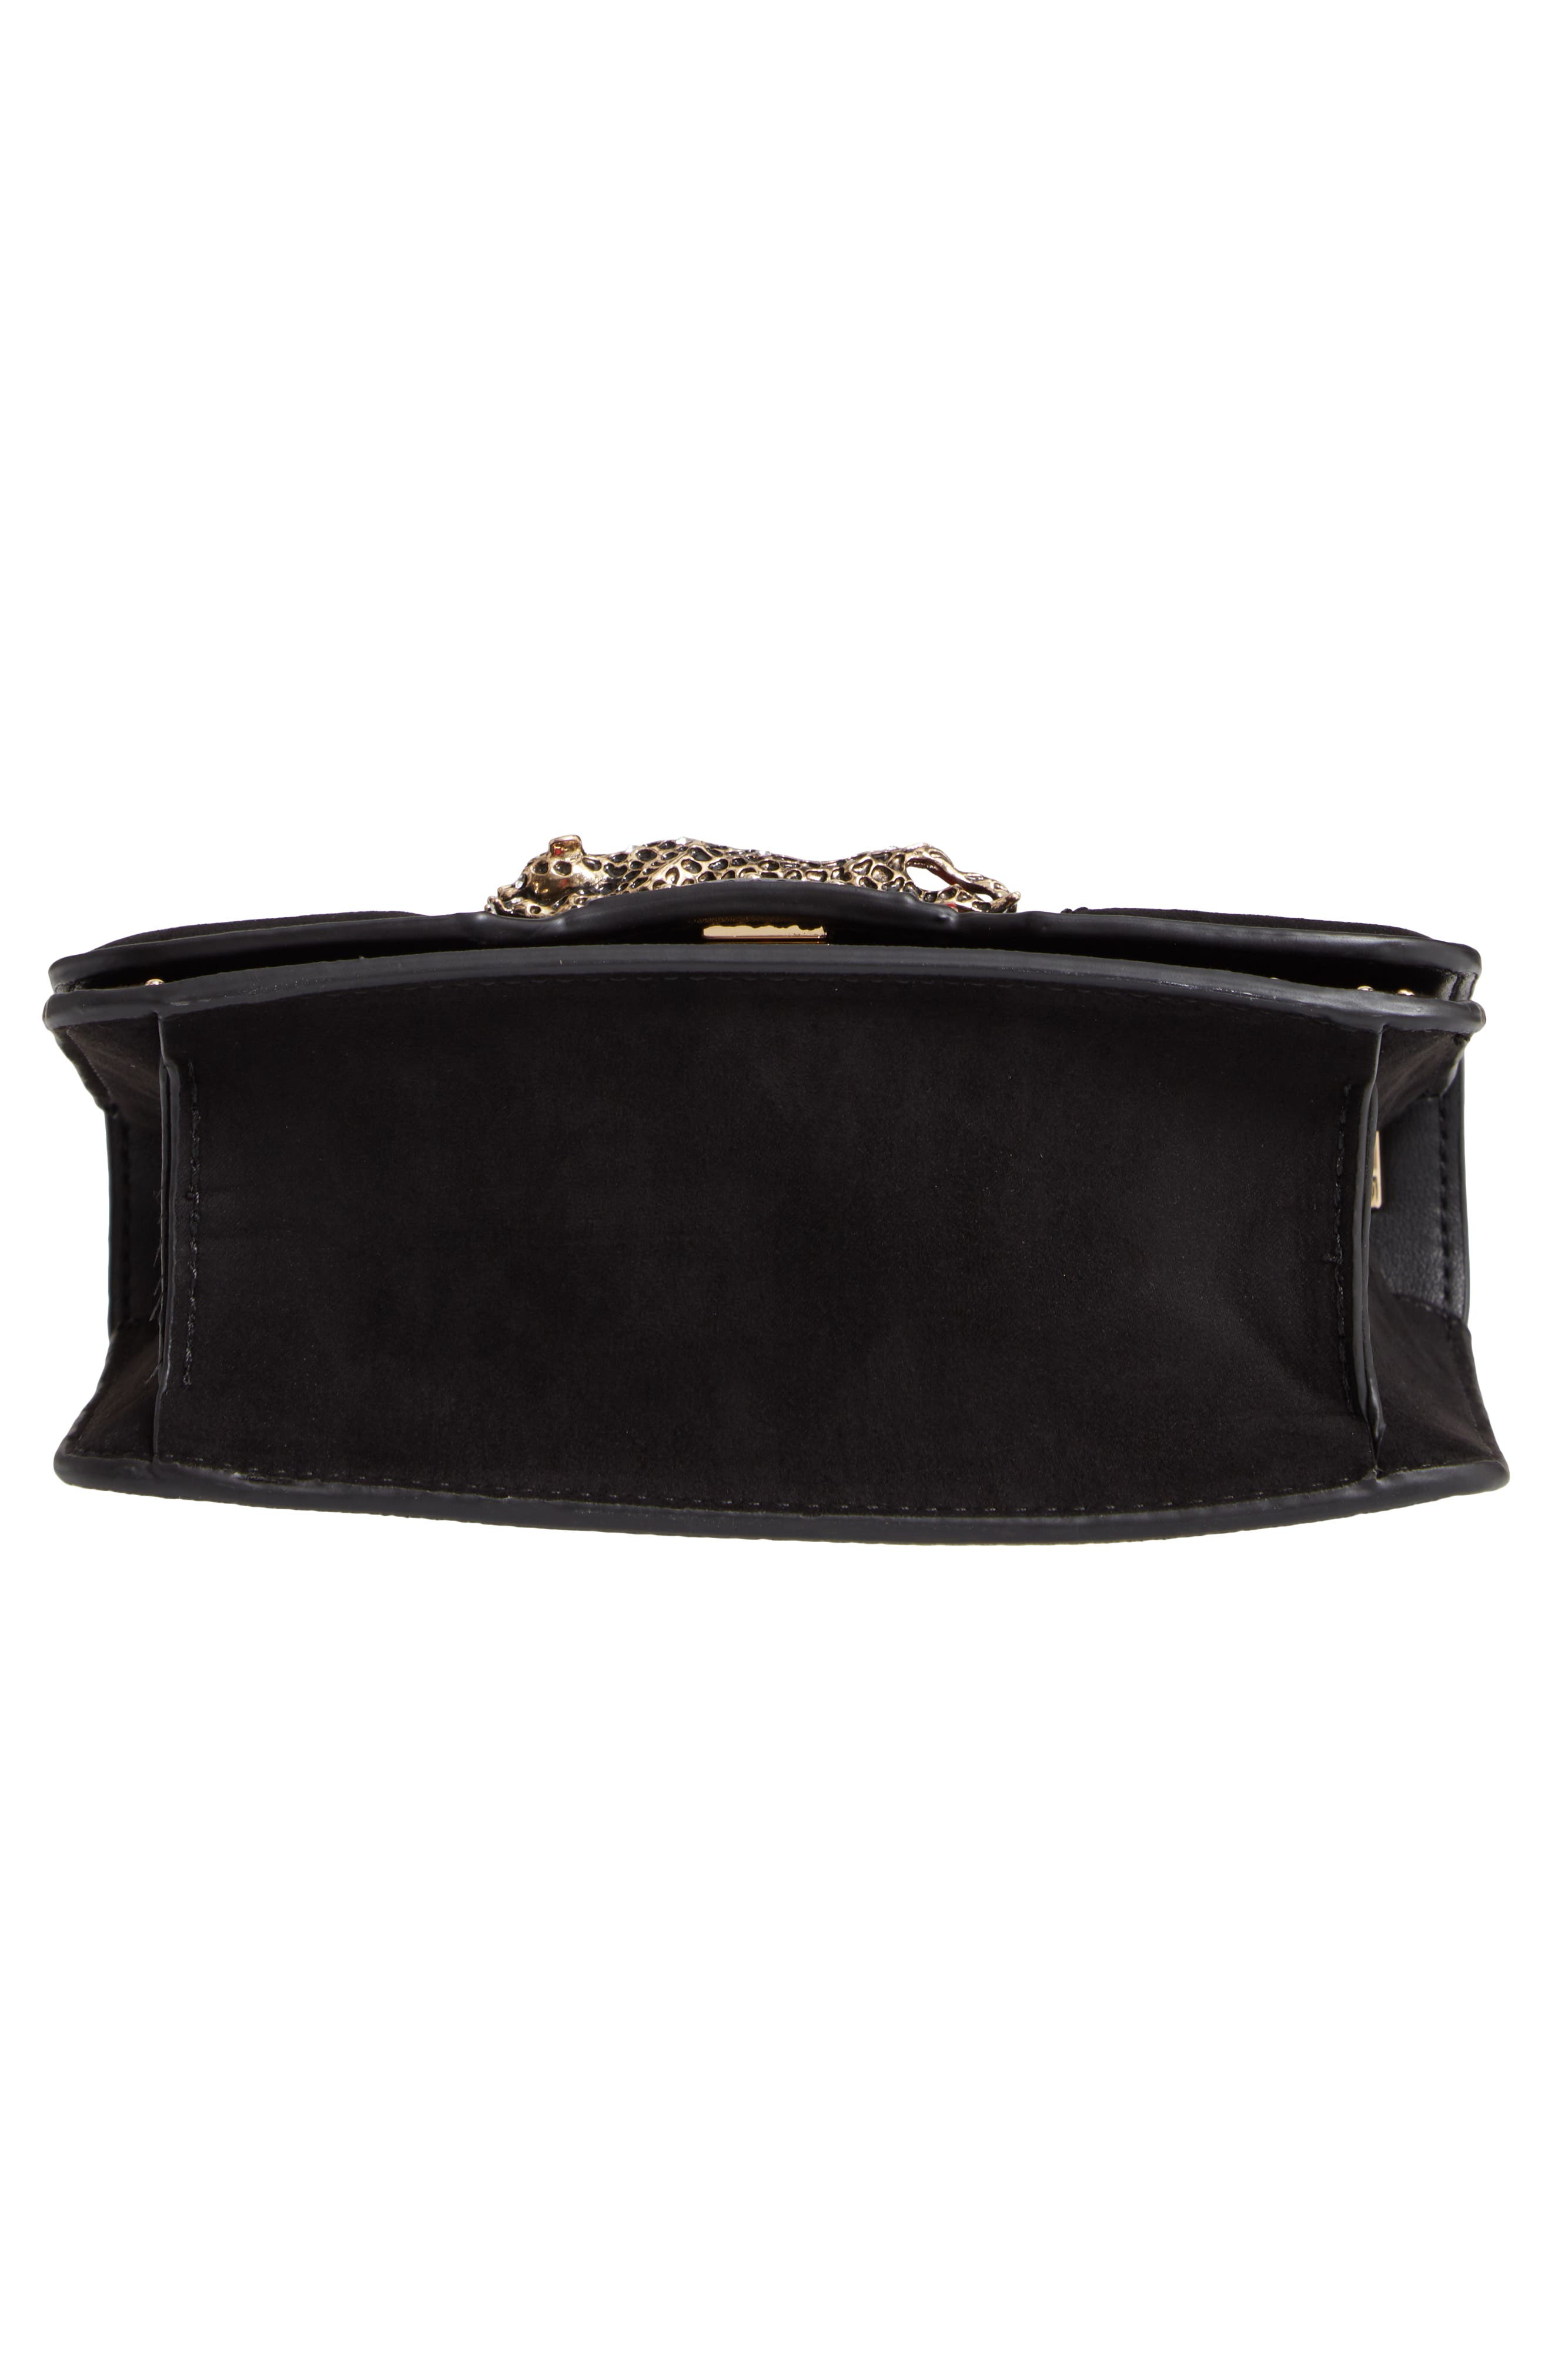 Panther Crossbody Bag,                             Alternate thumbnail 6, color,                             BLACK